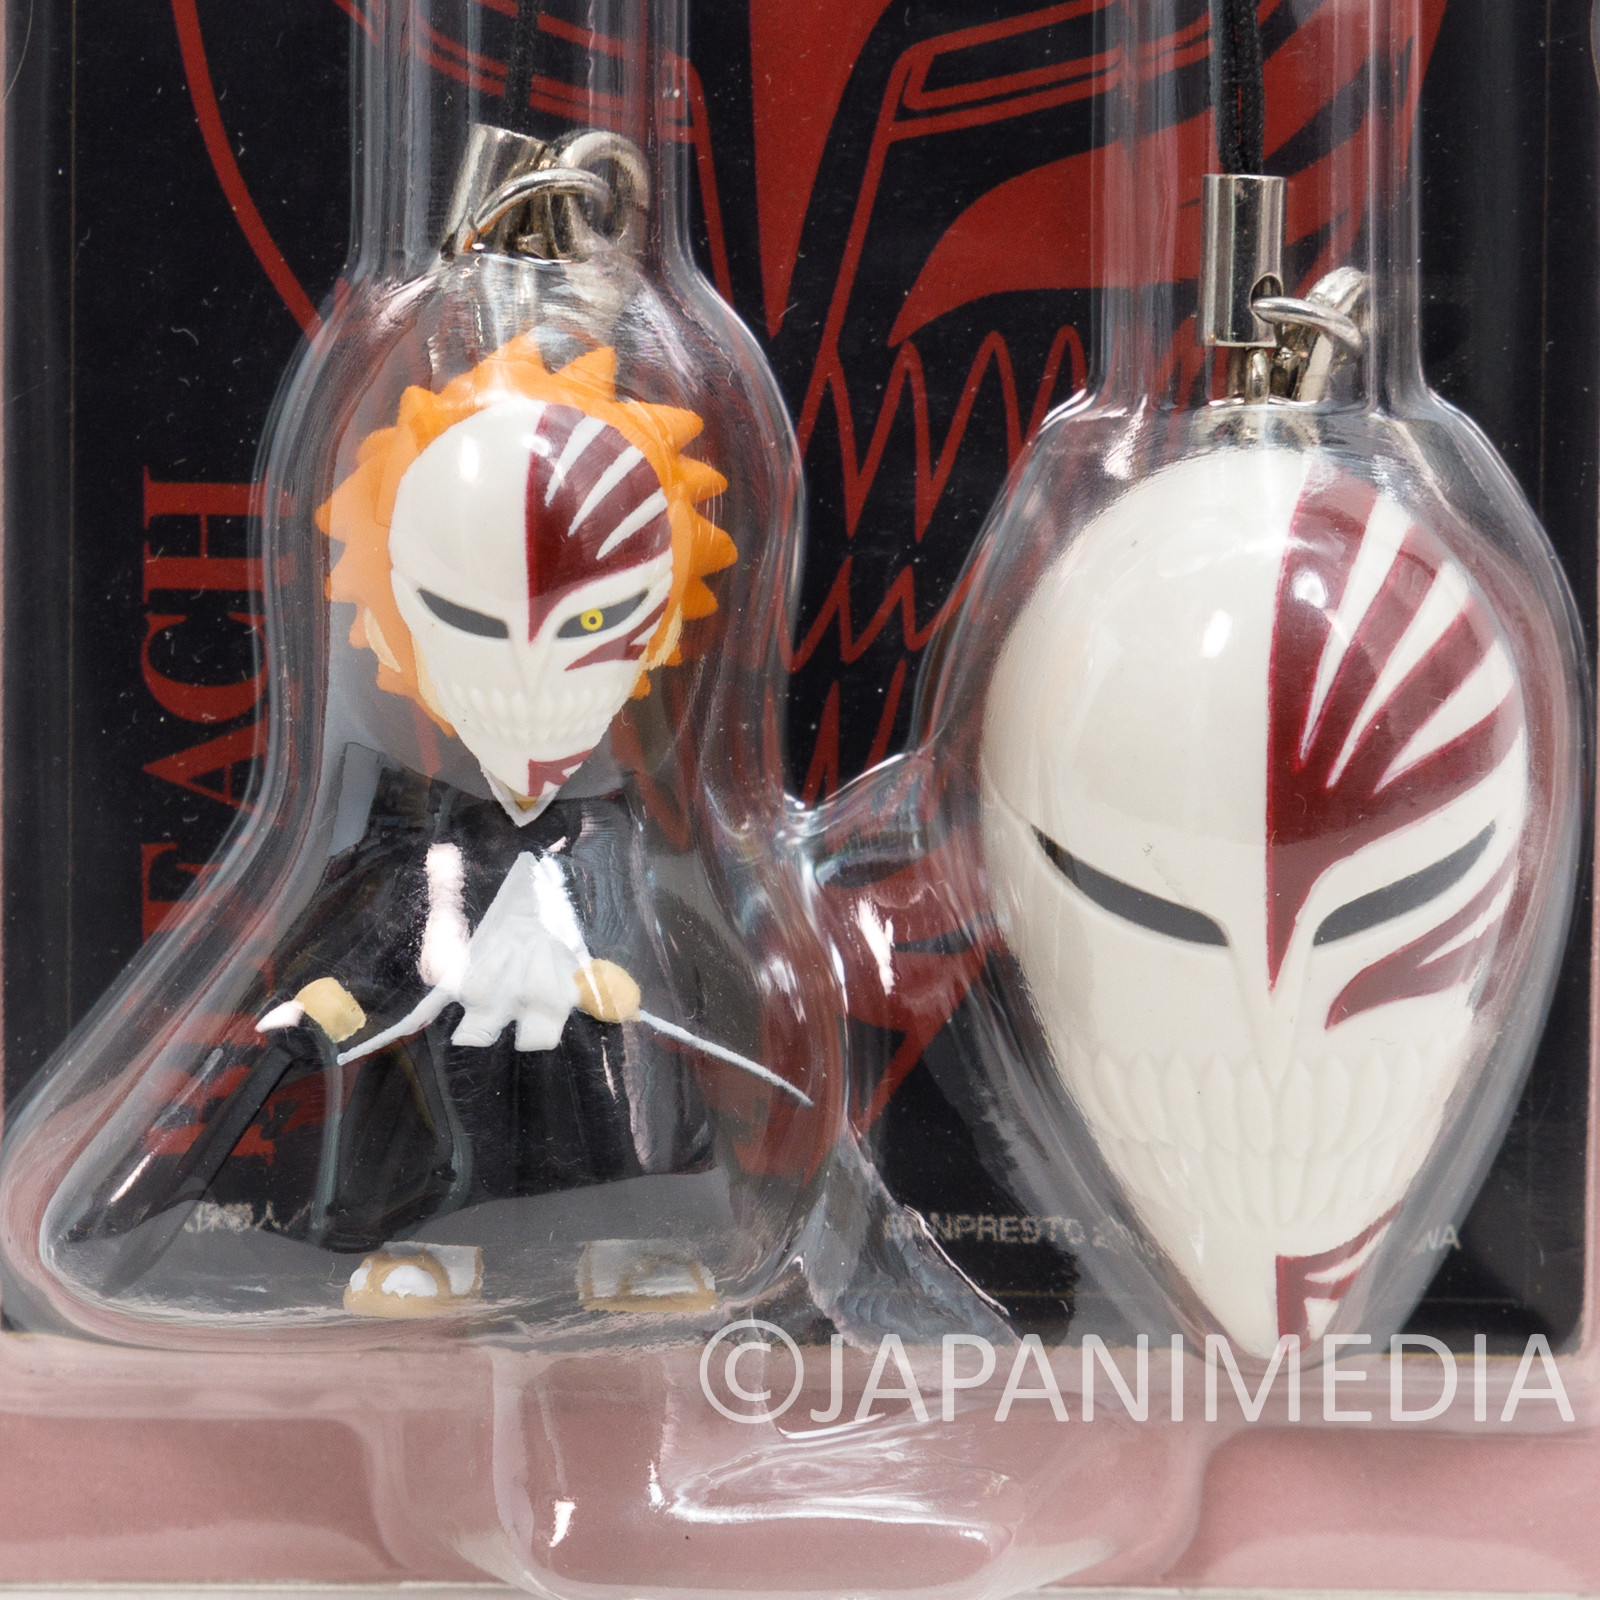 Bleach Ichigo Kurosaki & Mask Figure Strap Shonen Jump JAPAN ANIME